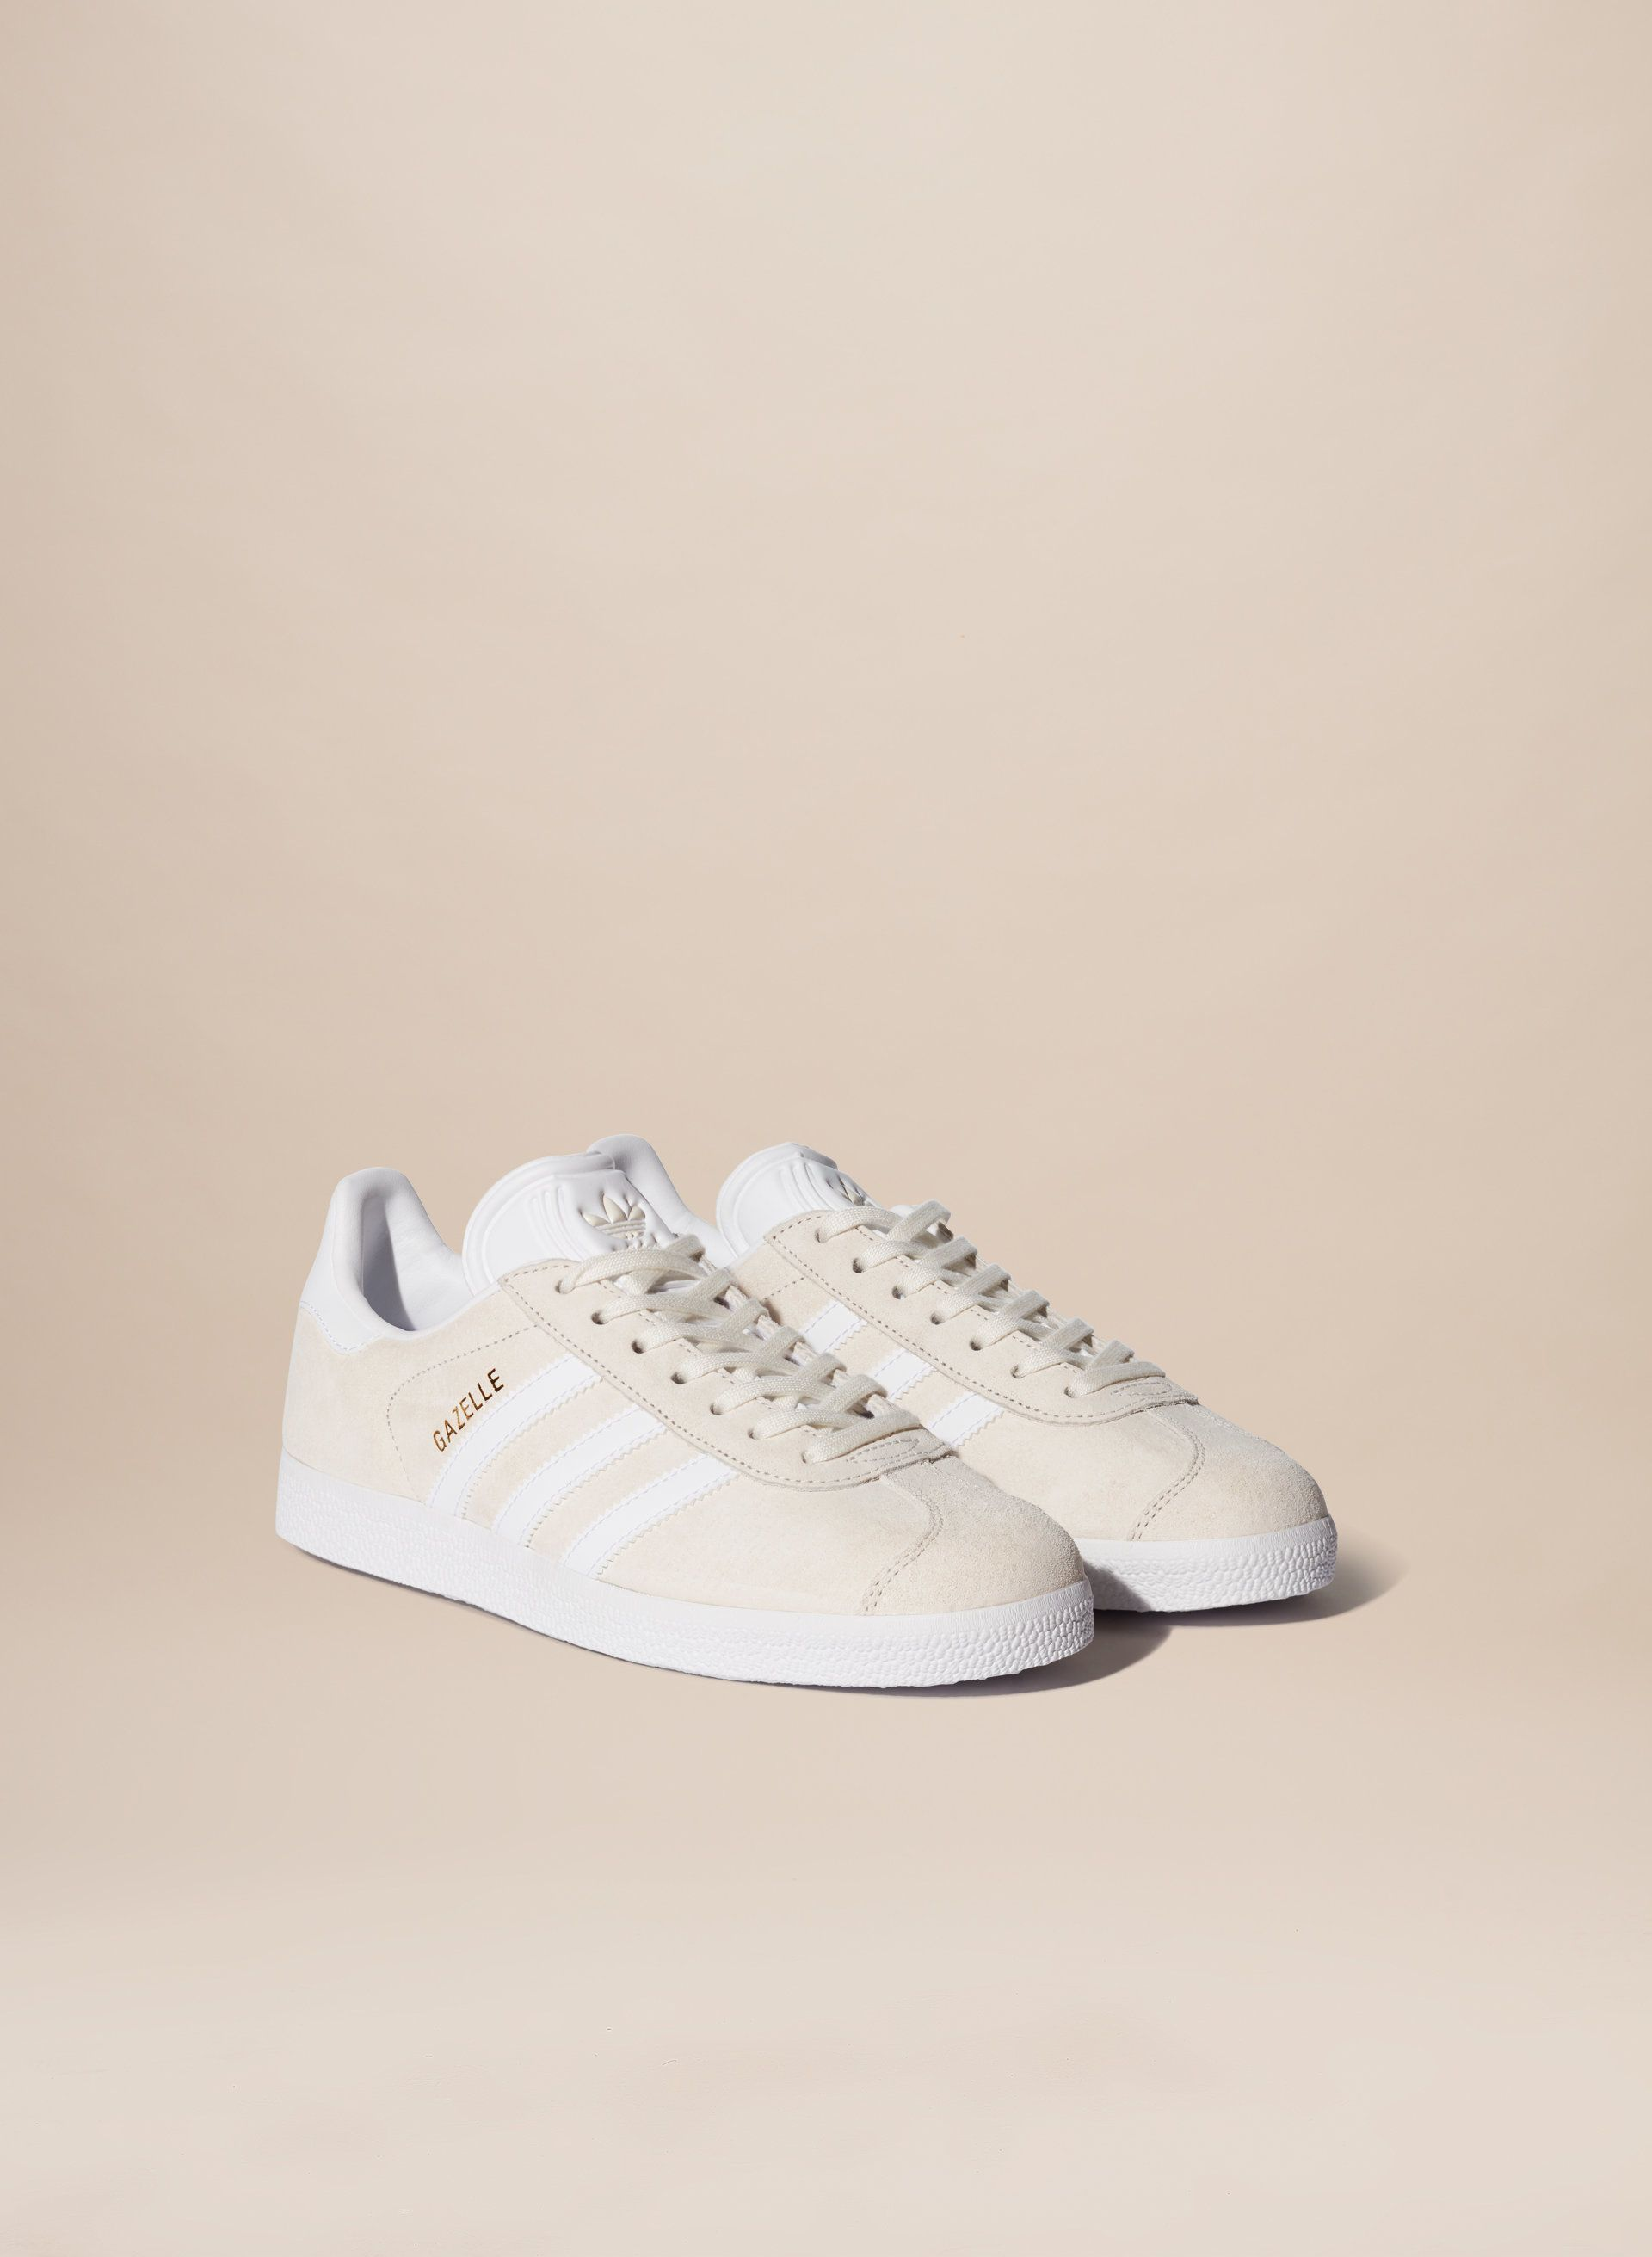 new style 2b145 301c3 Adidas GAZELLE SNEAKER  Aritzia